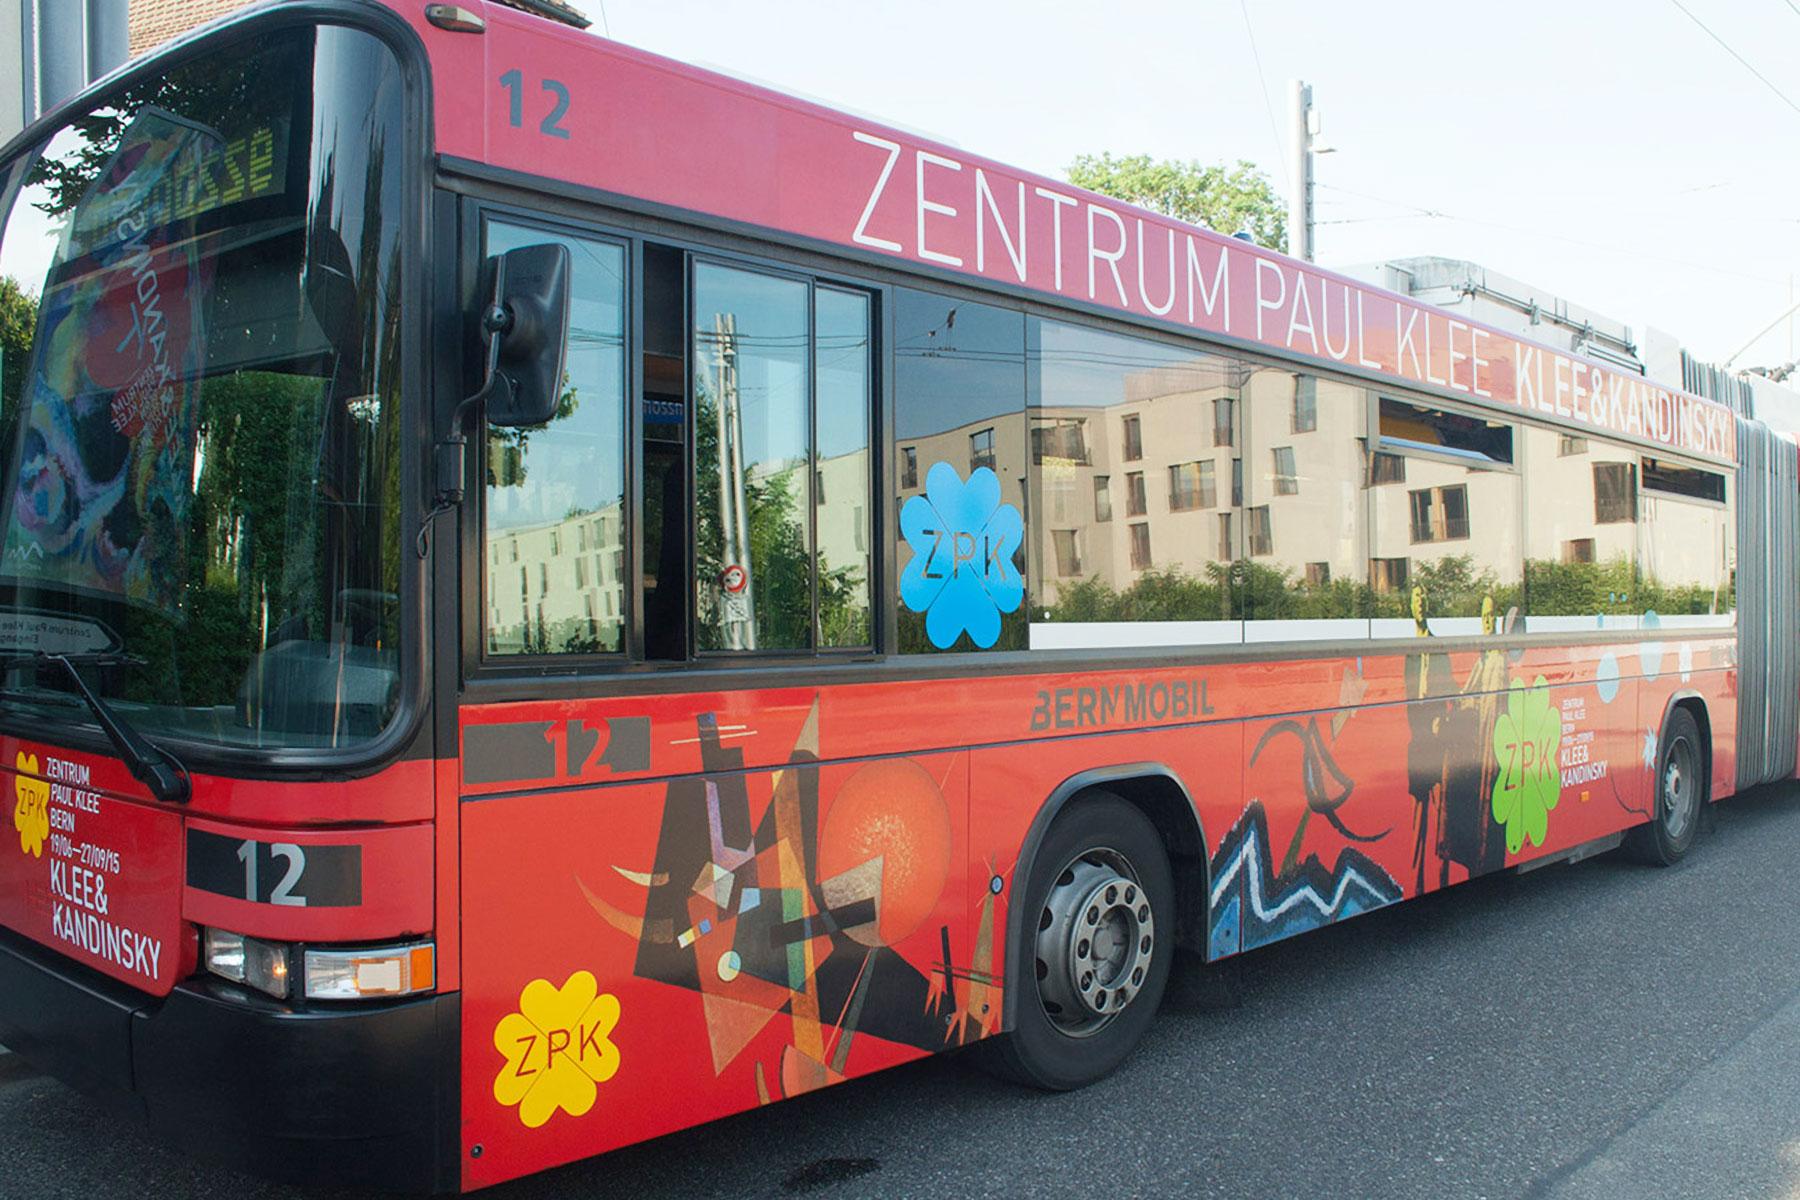 Zentrum Paul Klee Bus Werbung